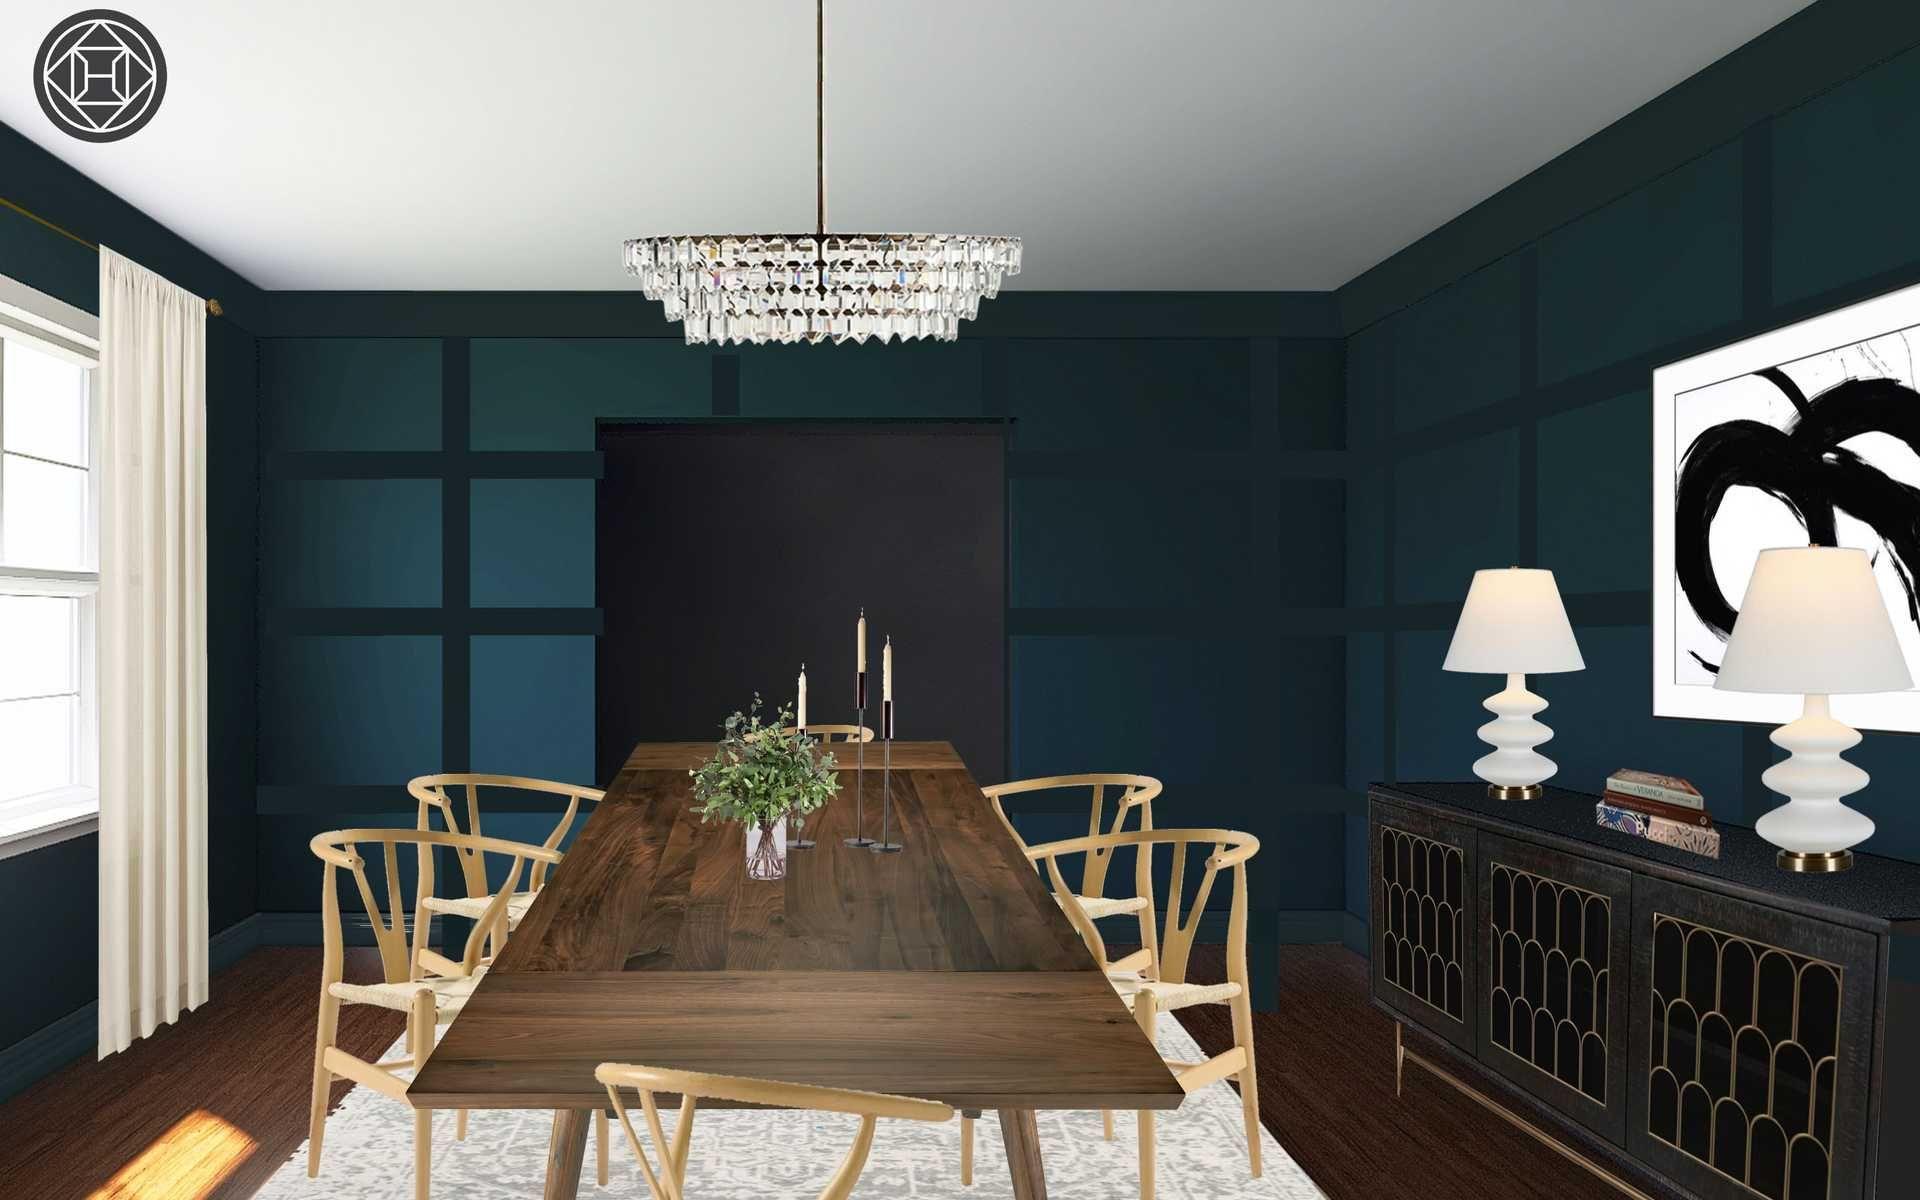 Contemporary Modern Glam Midcentury Modern Dining Room Design By Havenly Interior Designer Tara Dining Room Design Modern Dining Room Design Interior Design